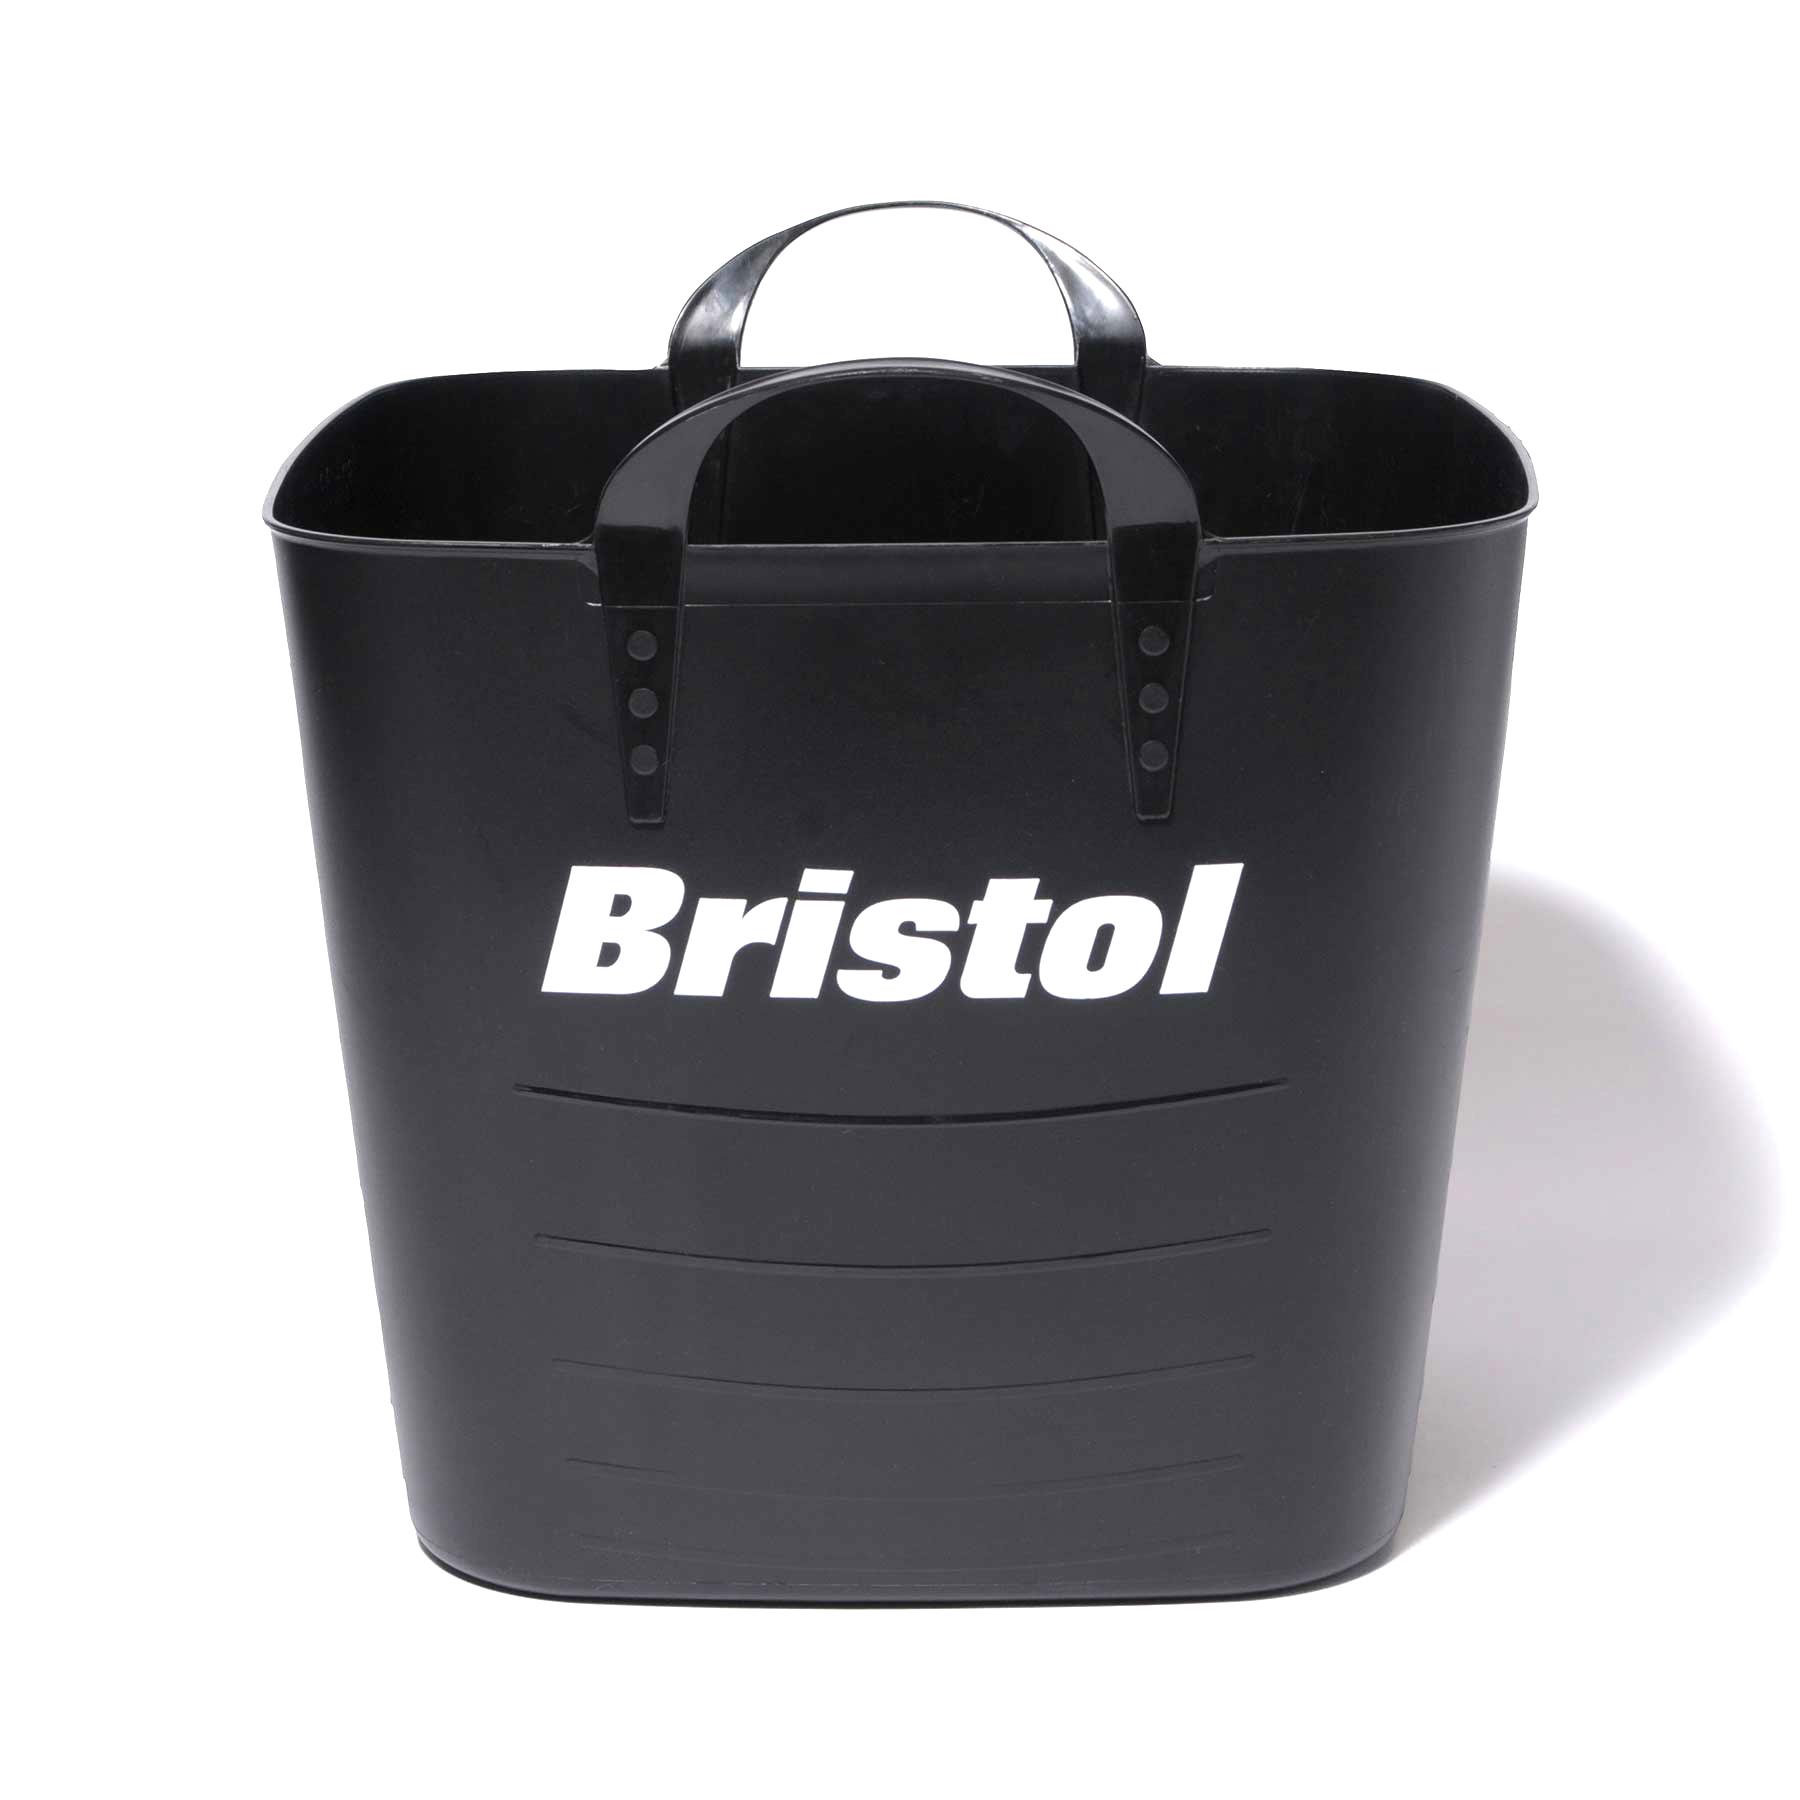 F.C.Real Bristol / STACKSTO BAQUET -B(BRISTOL)